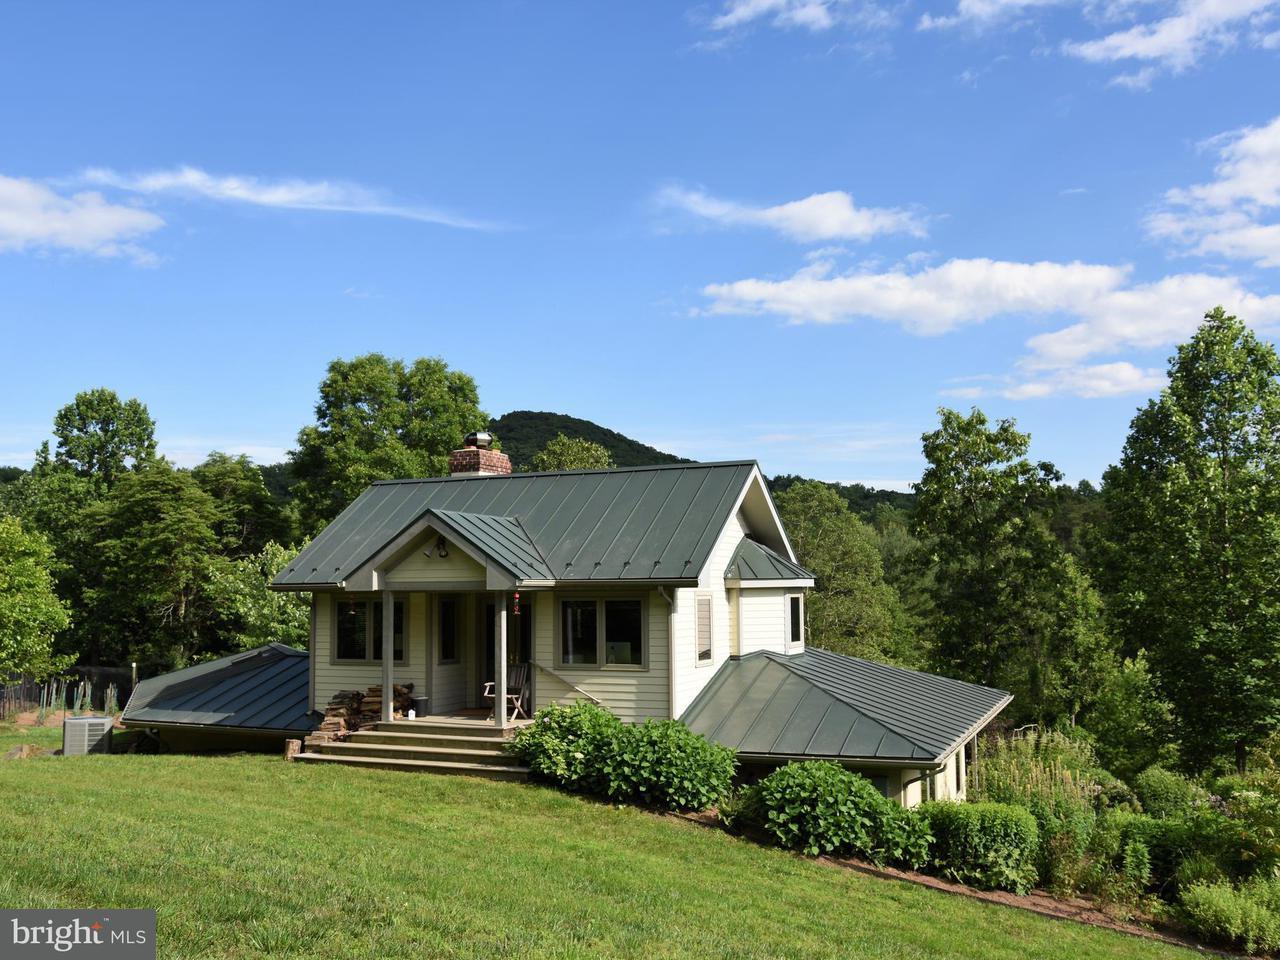 独户住宅 为 销售 在 821 LONG MOUNTAIN Road 821 LONG MOUNTAIN Road Washington, 弗吉尼亚州 22747 美国